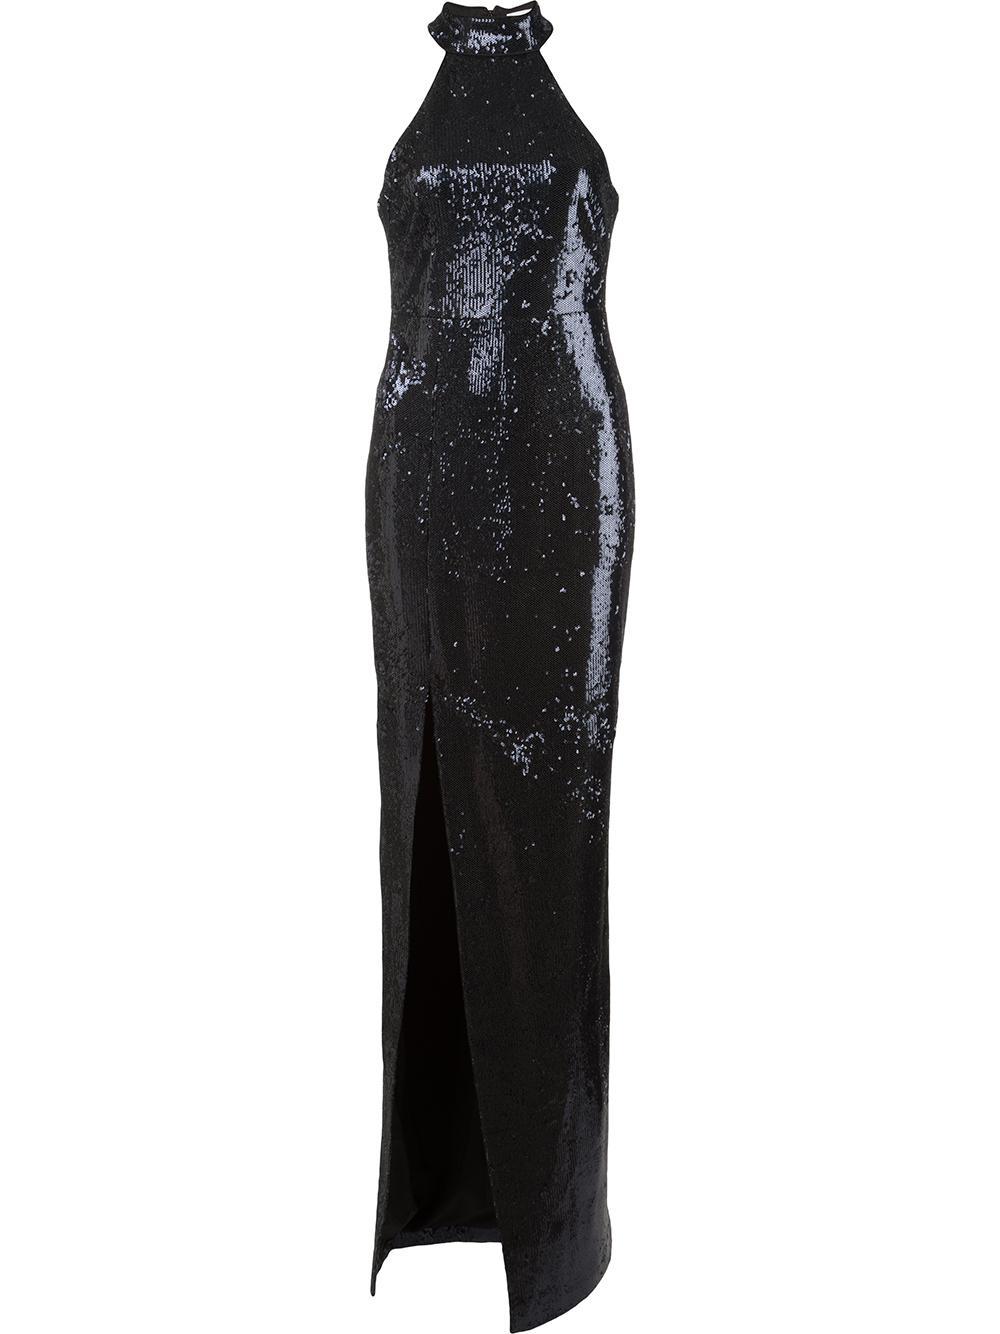 Carrie Mock Neck Sequin Gown